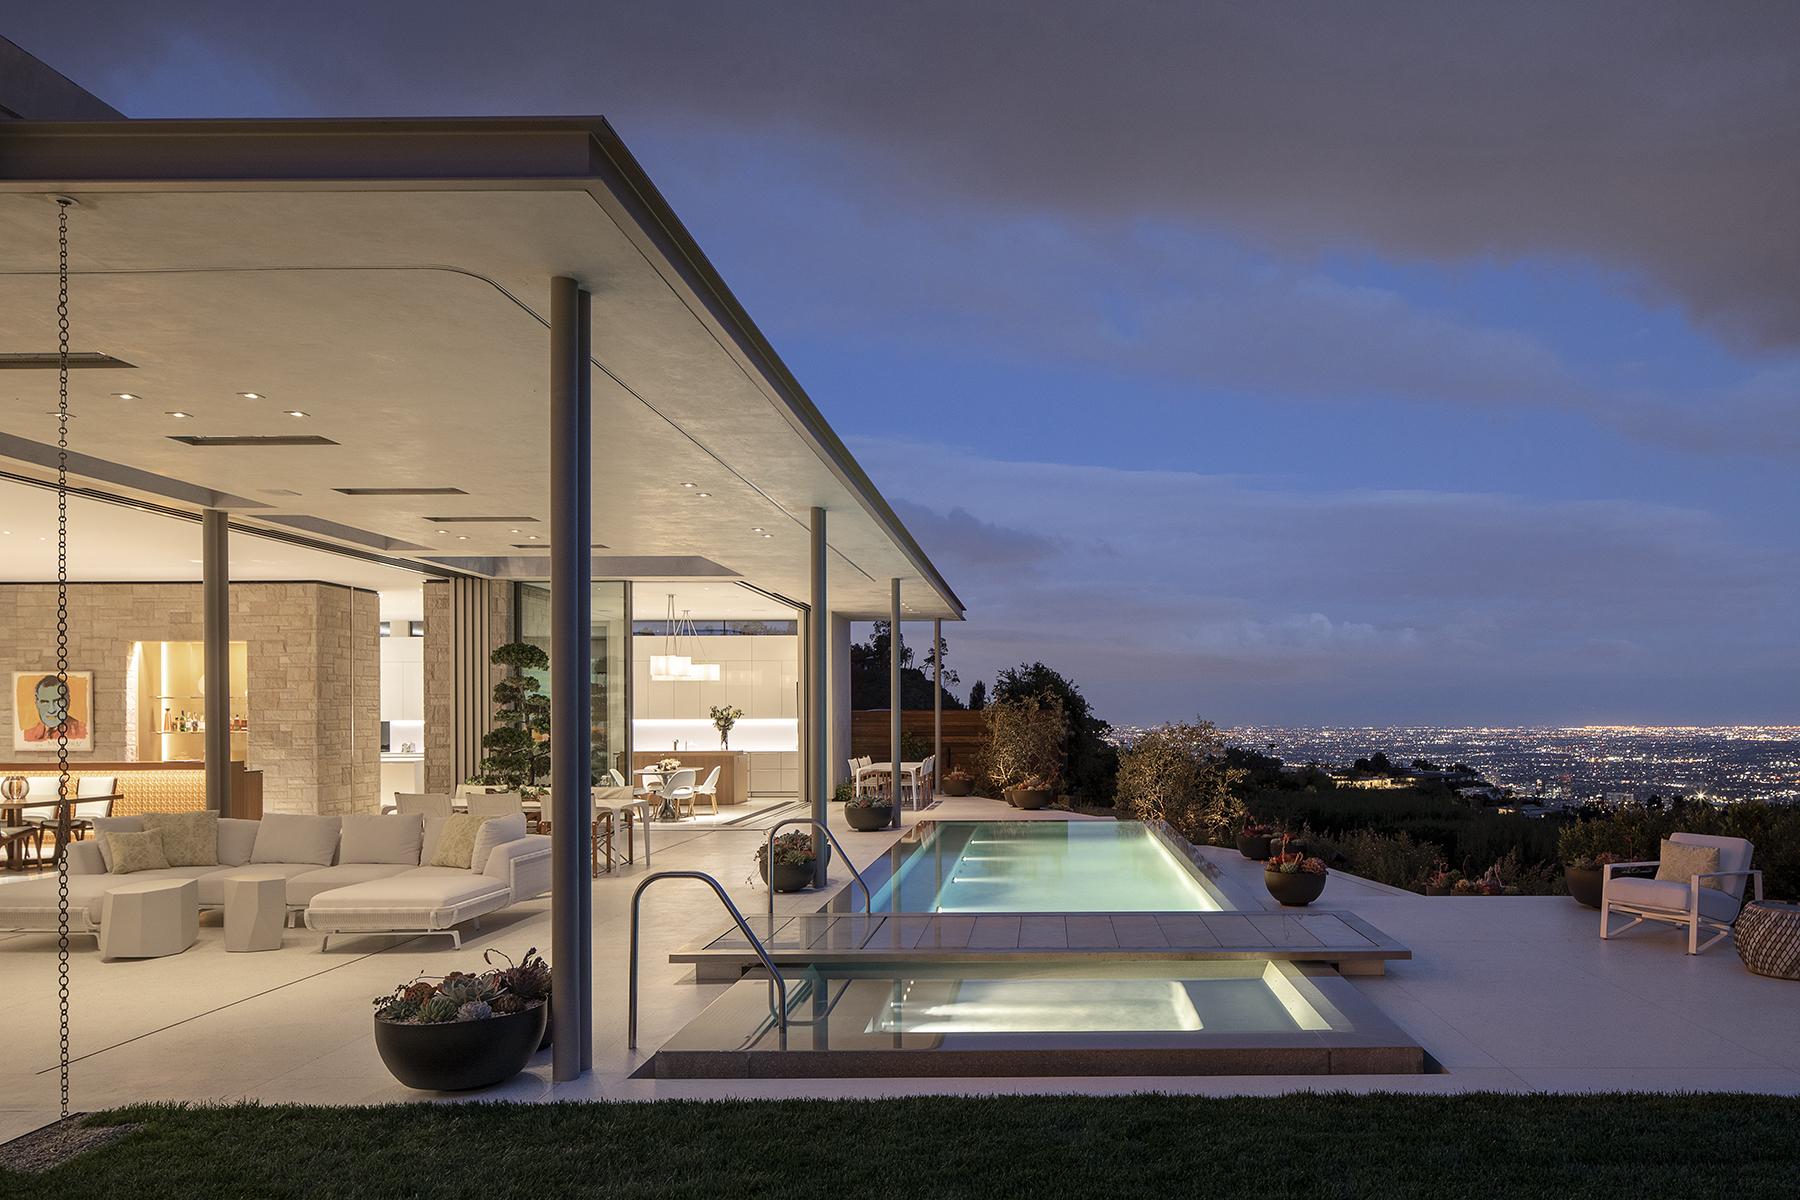 Modern home in LA with breeze blocks